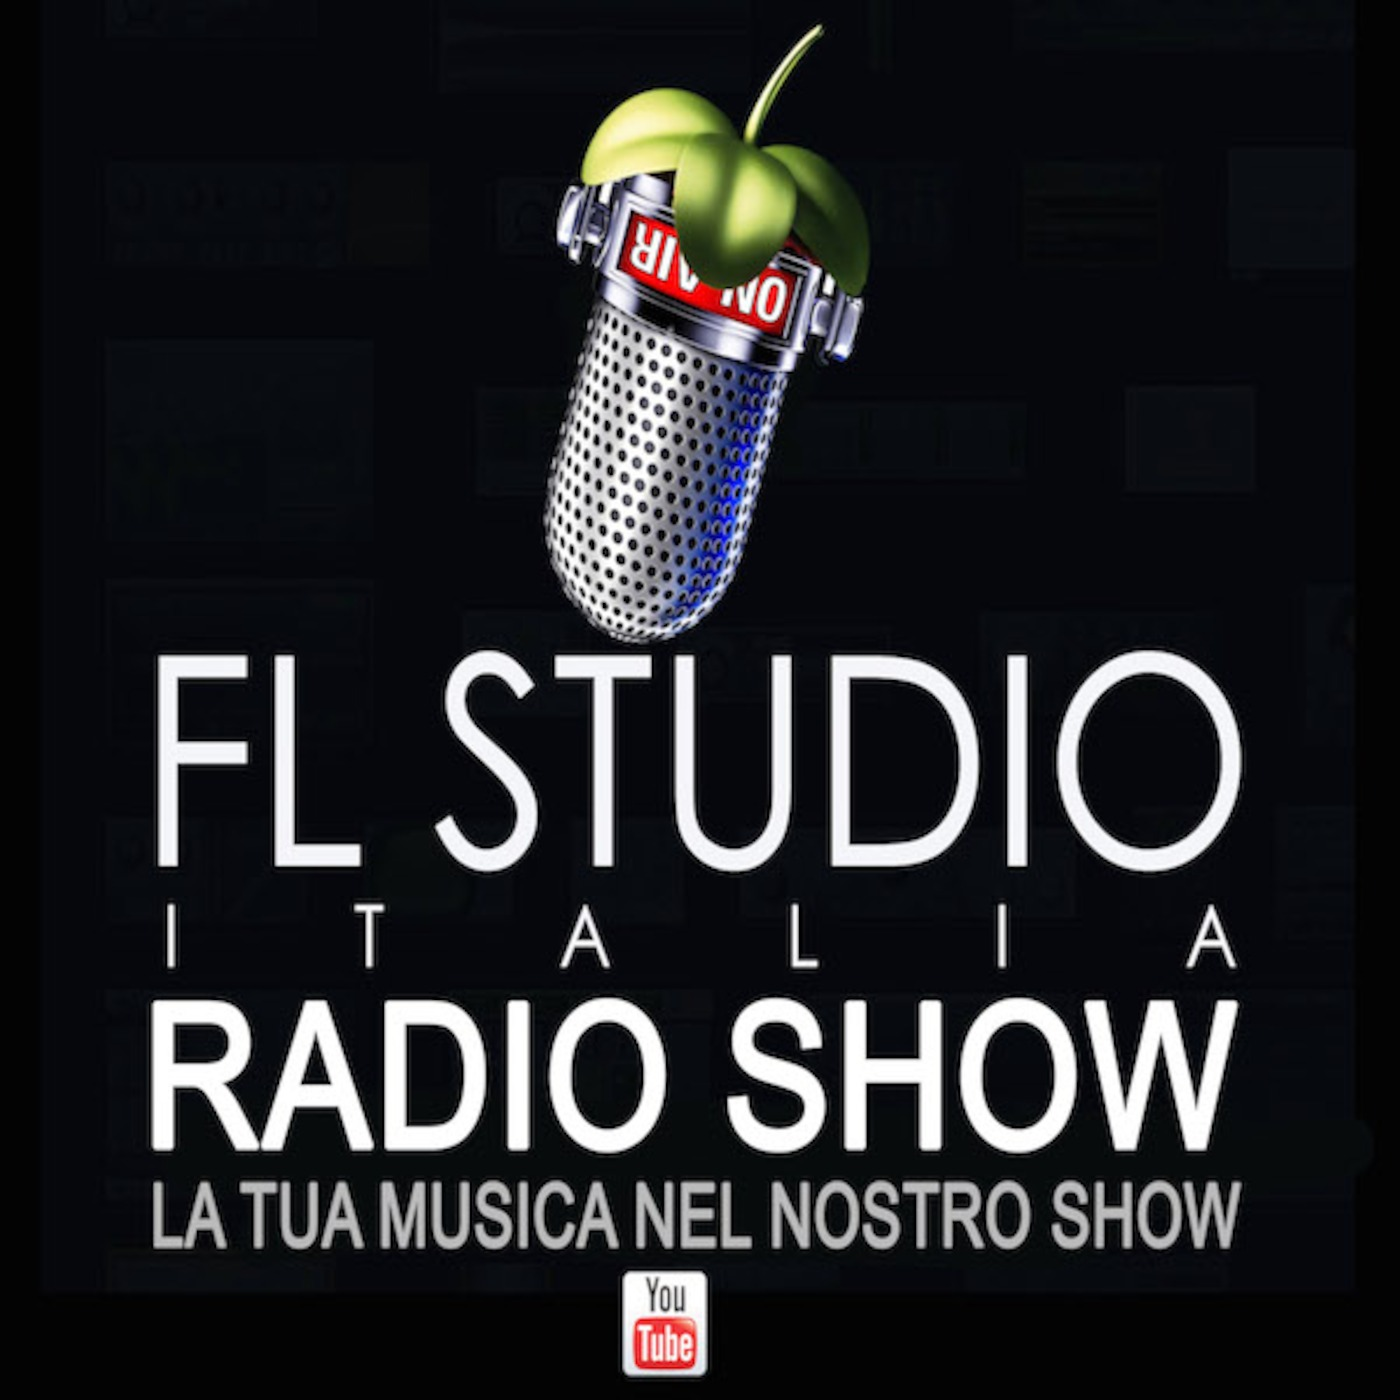 FL STUDIO RADIO SHOW